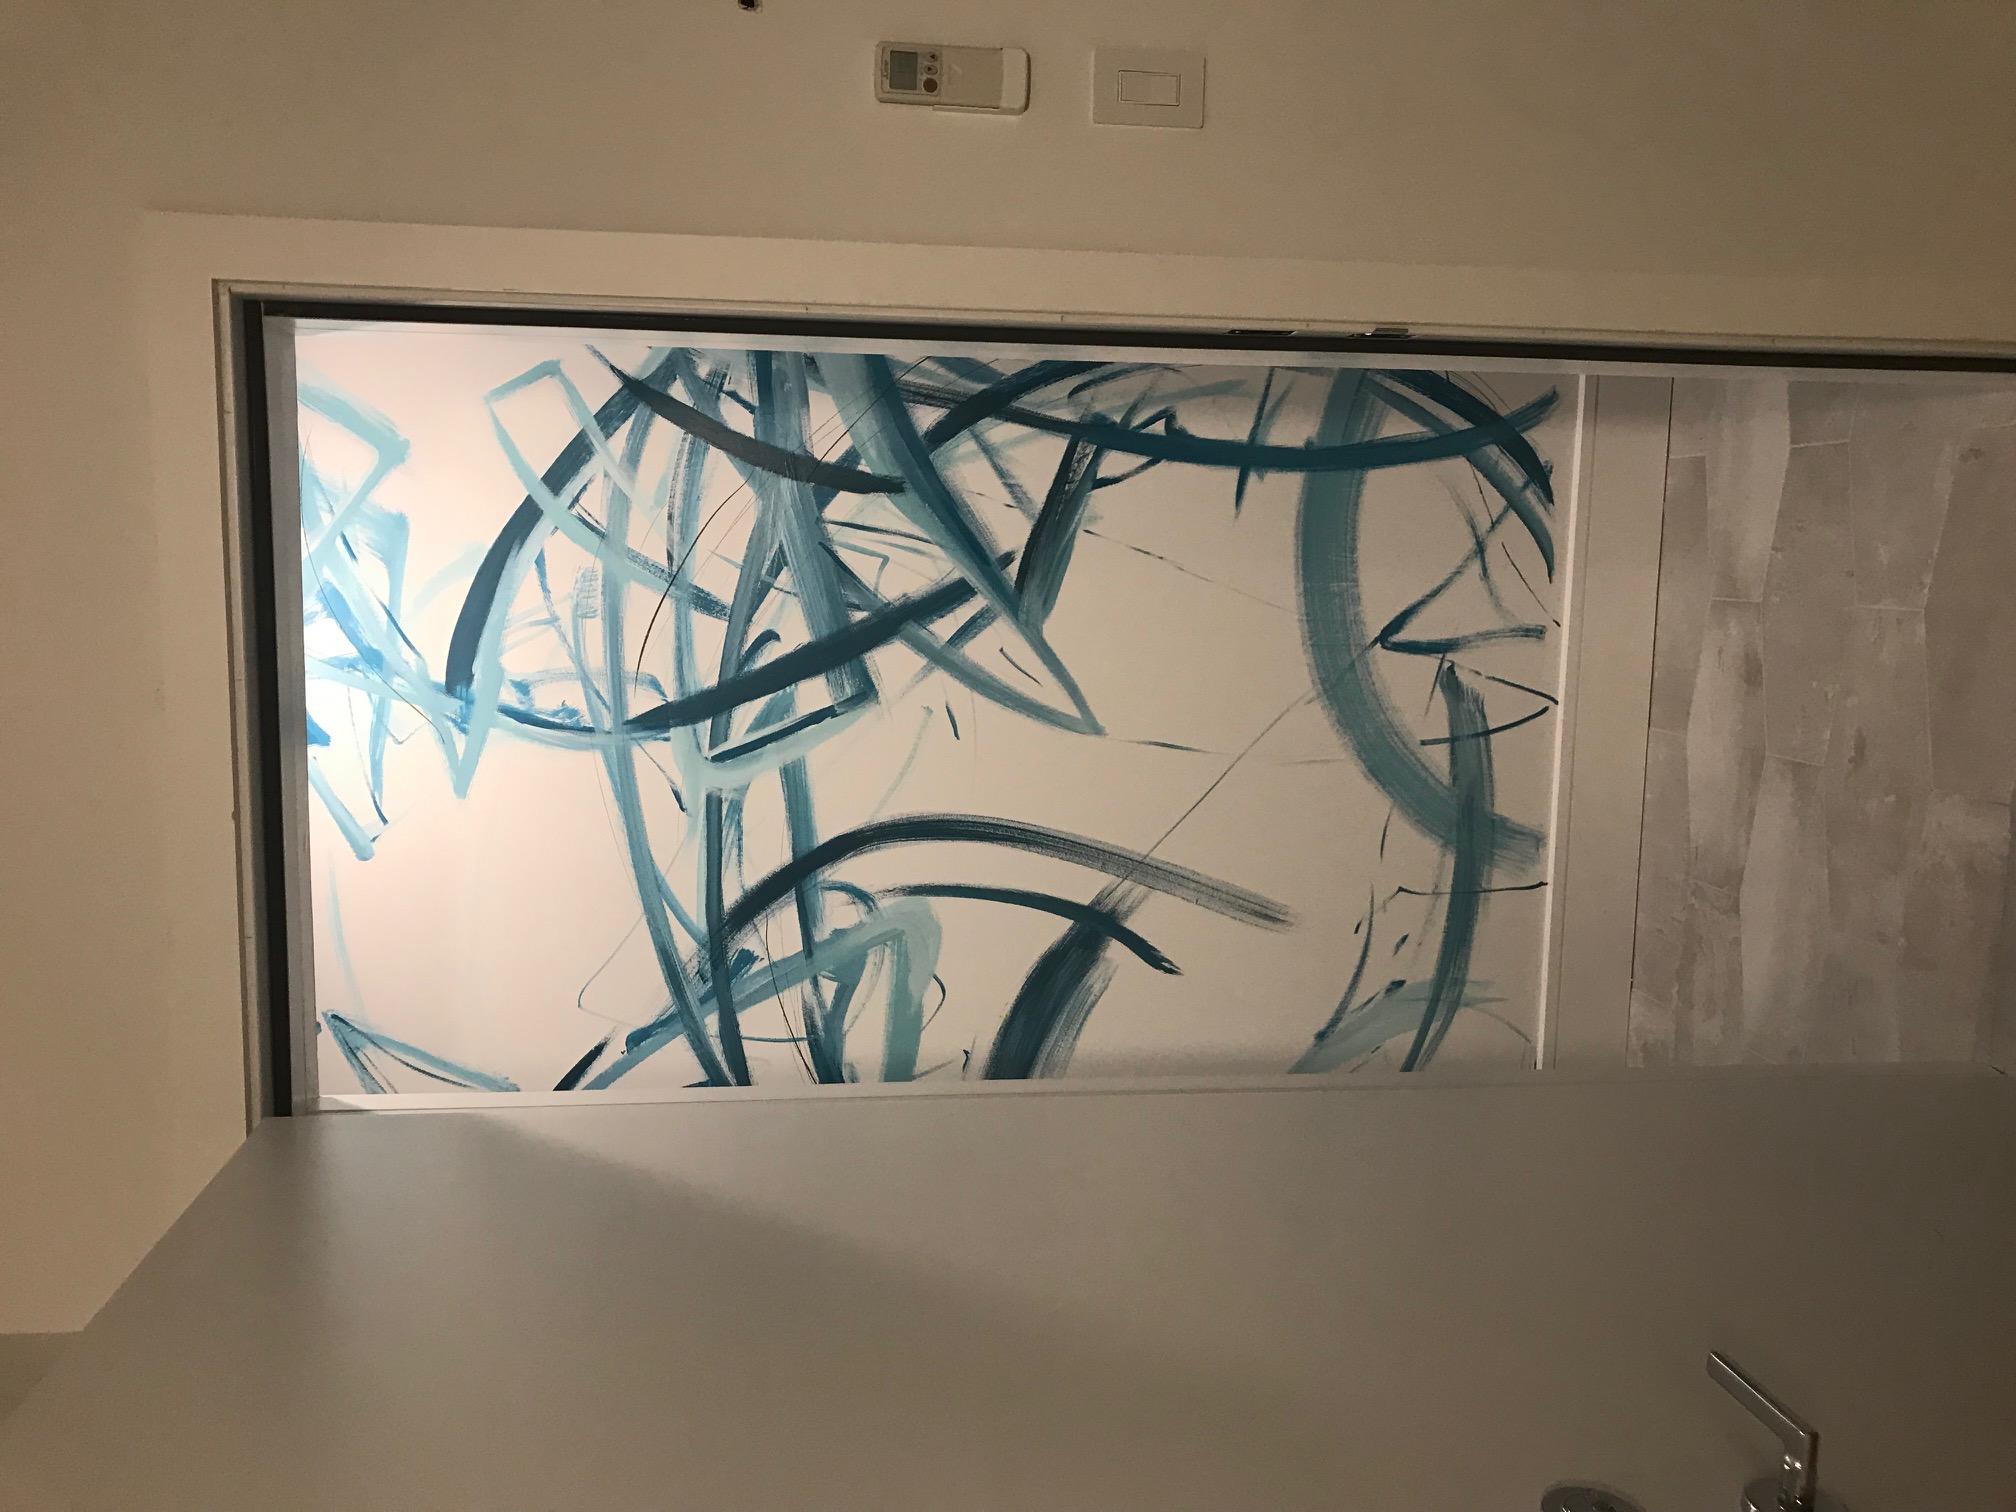 Piero Manrique Abstract Wall Mural frame